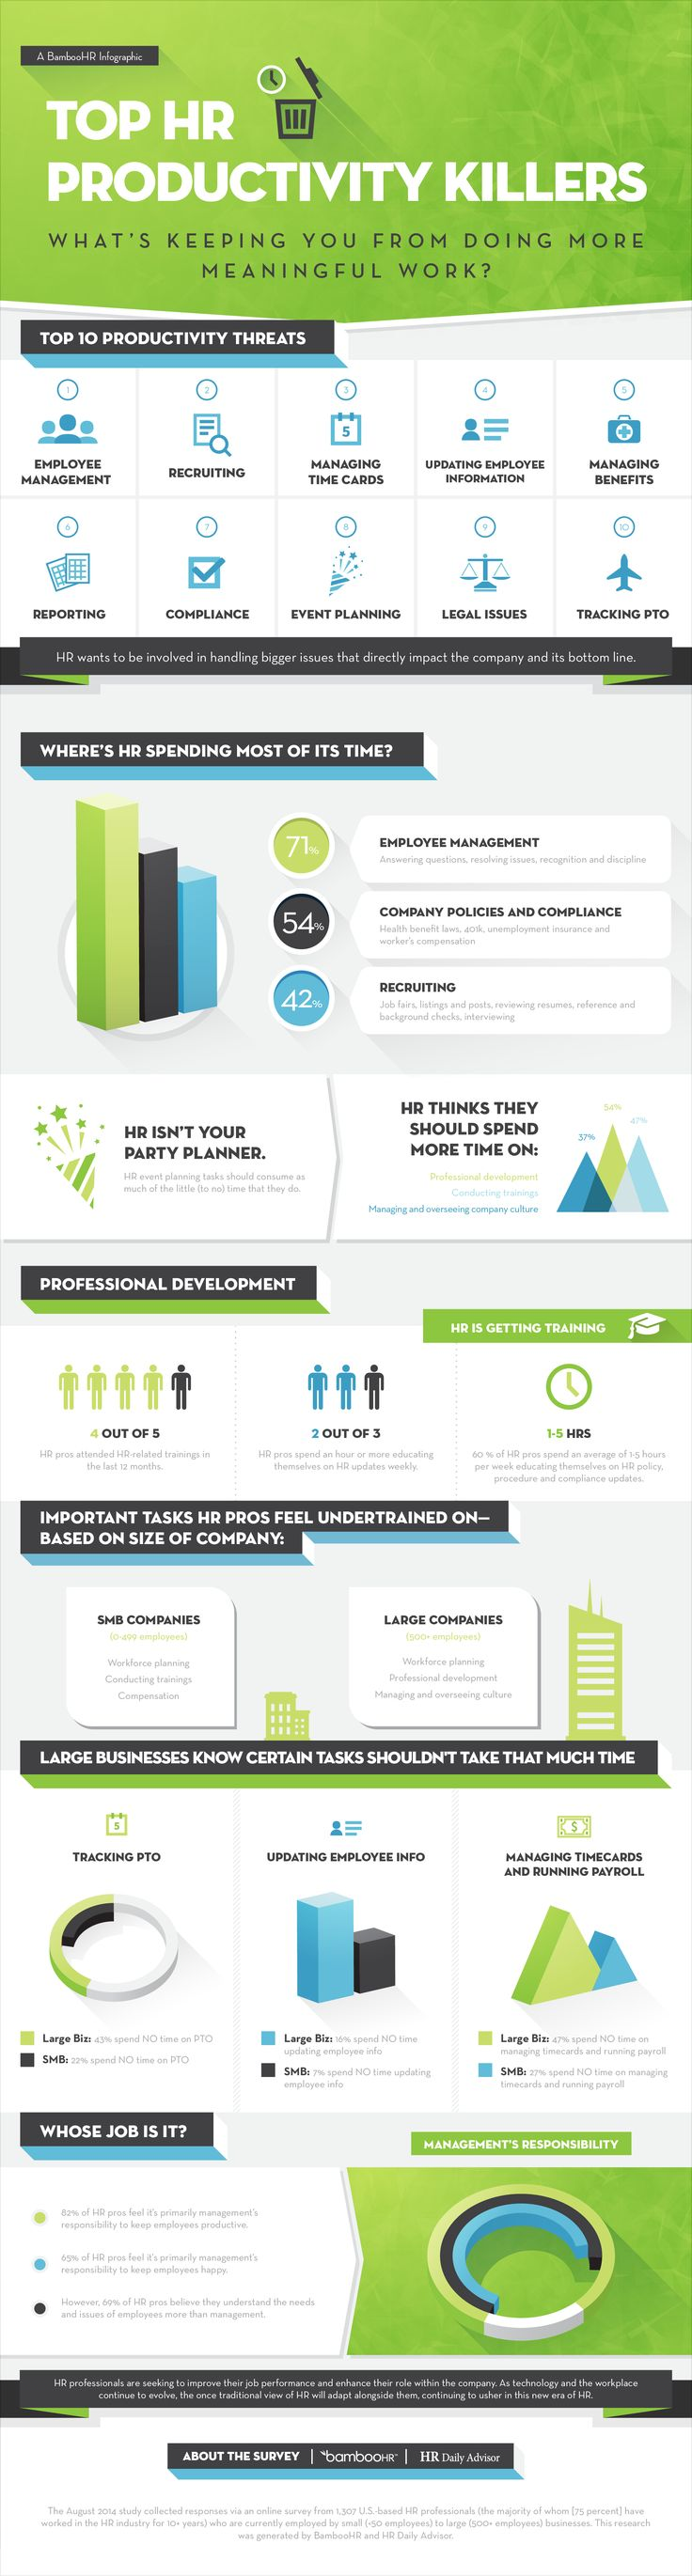 Infographic_The_Strategic_Costs_of_Employee_Management_Minutiae_FINAL via @undercoverrec